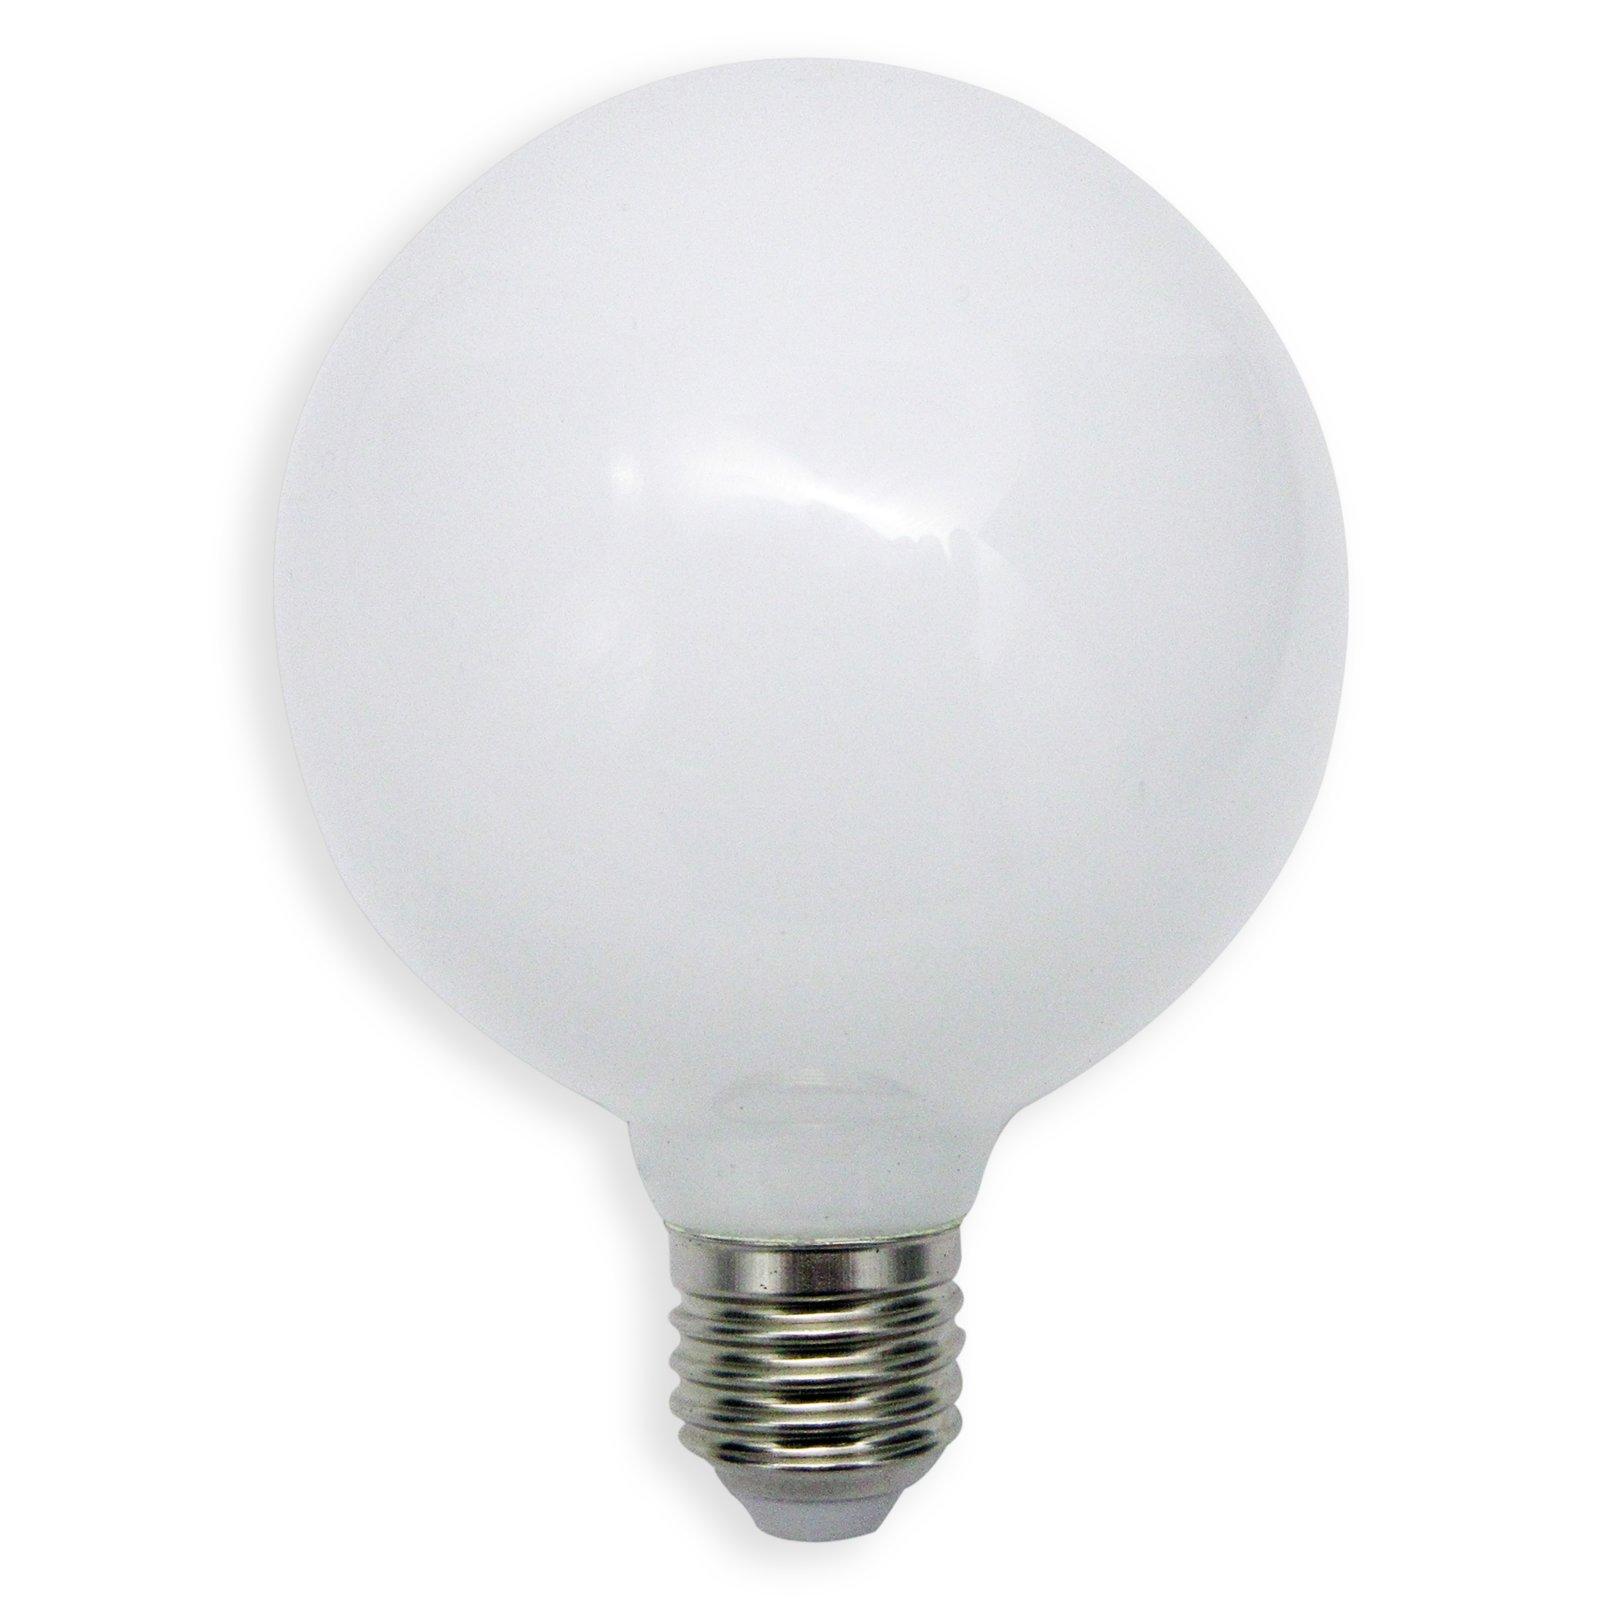 led leuchtmittel globe nostalgia lightime e27 5 w warmwei led leuchtmittel. Black Bedroom Furniture Sets. Home Design Ideas